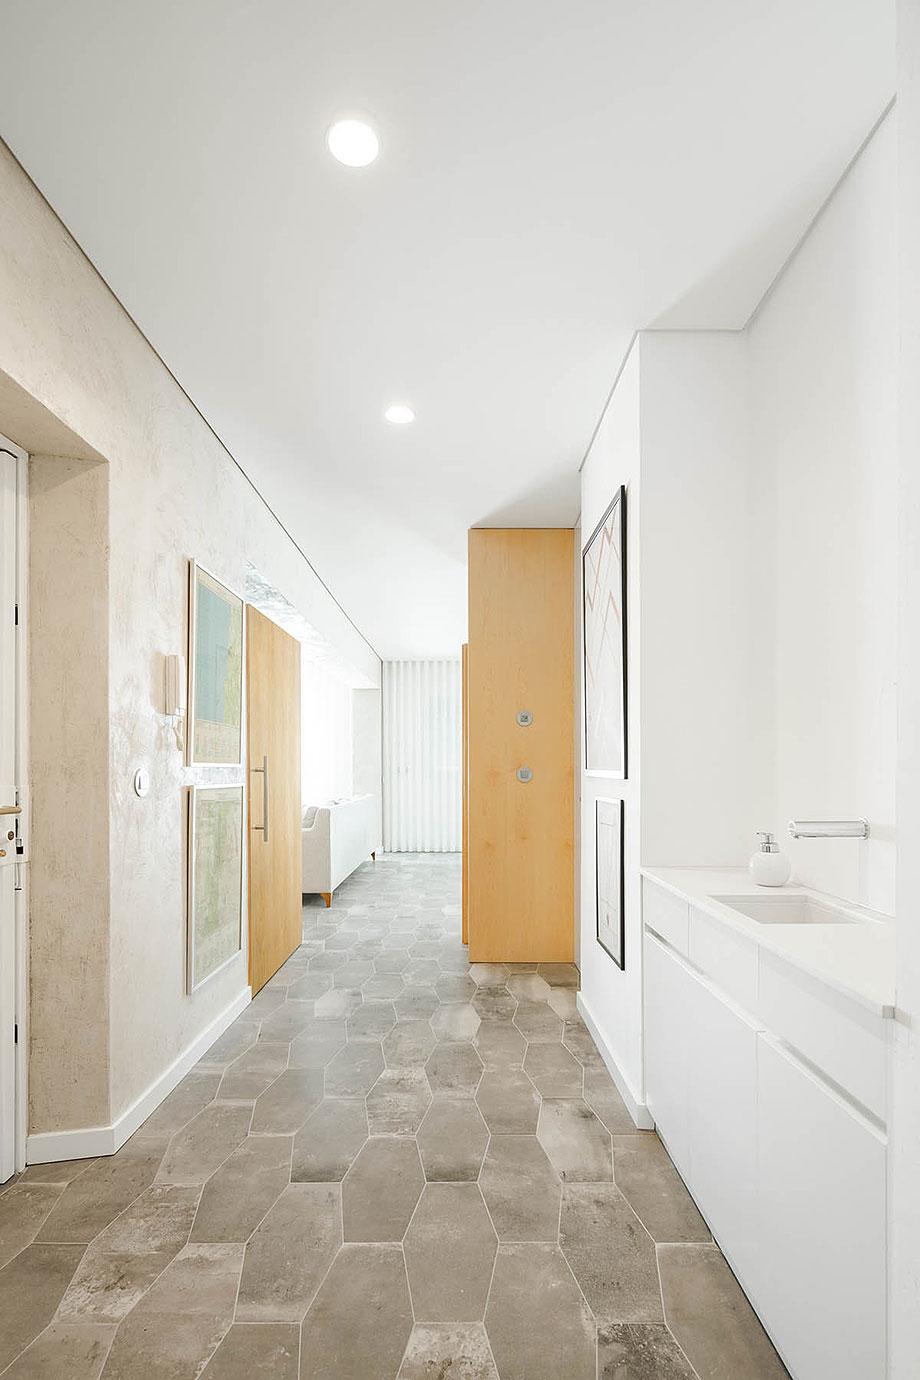 apartamento en oporto por paulo moreira architectures (14) - foto ivo tavares